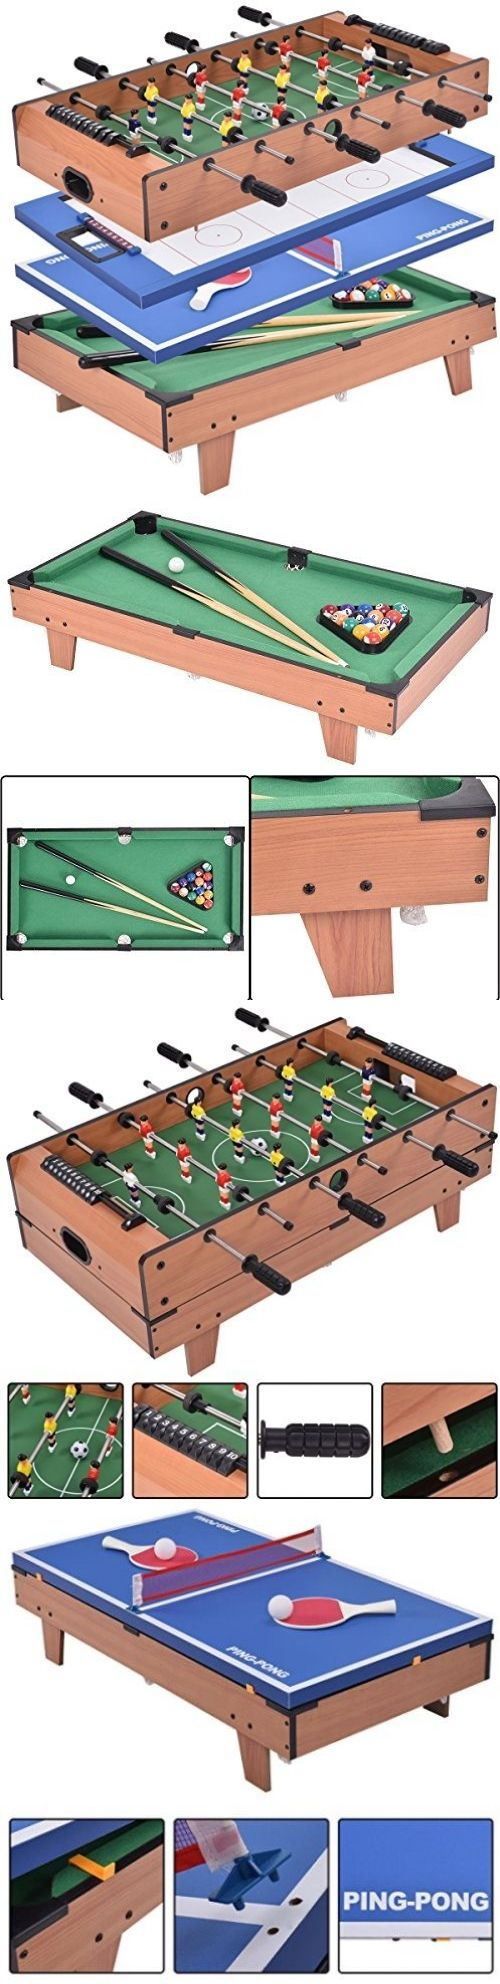 Tables 21213: Giantex 4 In 1 Multi Game Table Pool Air Hockey Foosball Table Tennis Billiard -> BUY IT NOW ONLY: $183.78 on eBay!